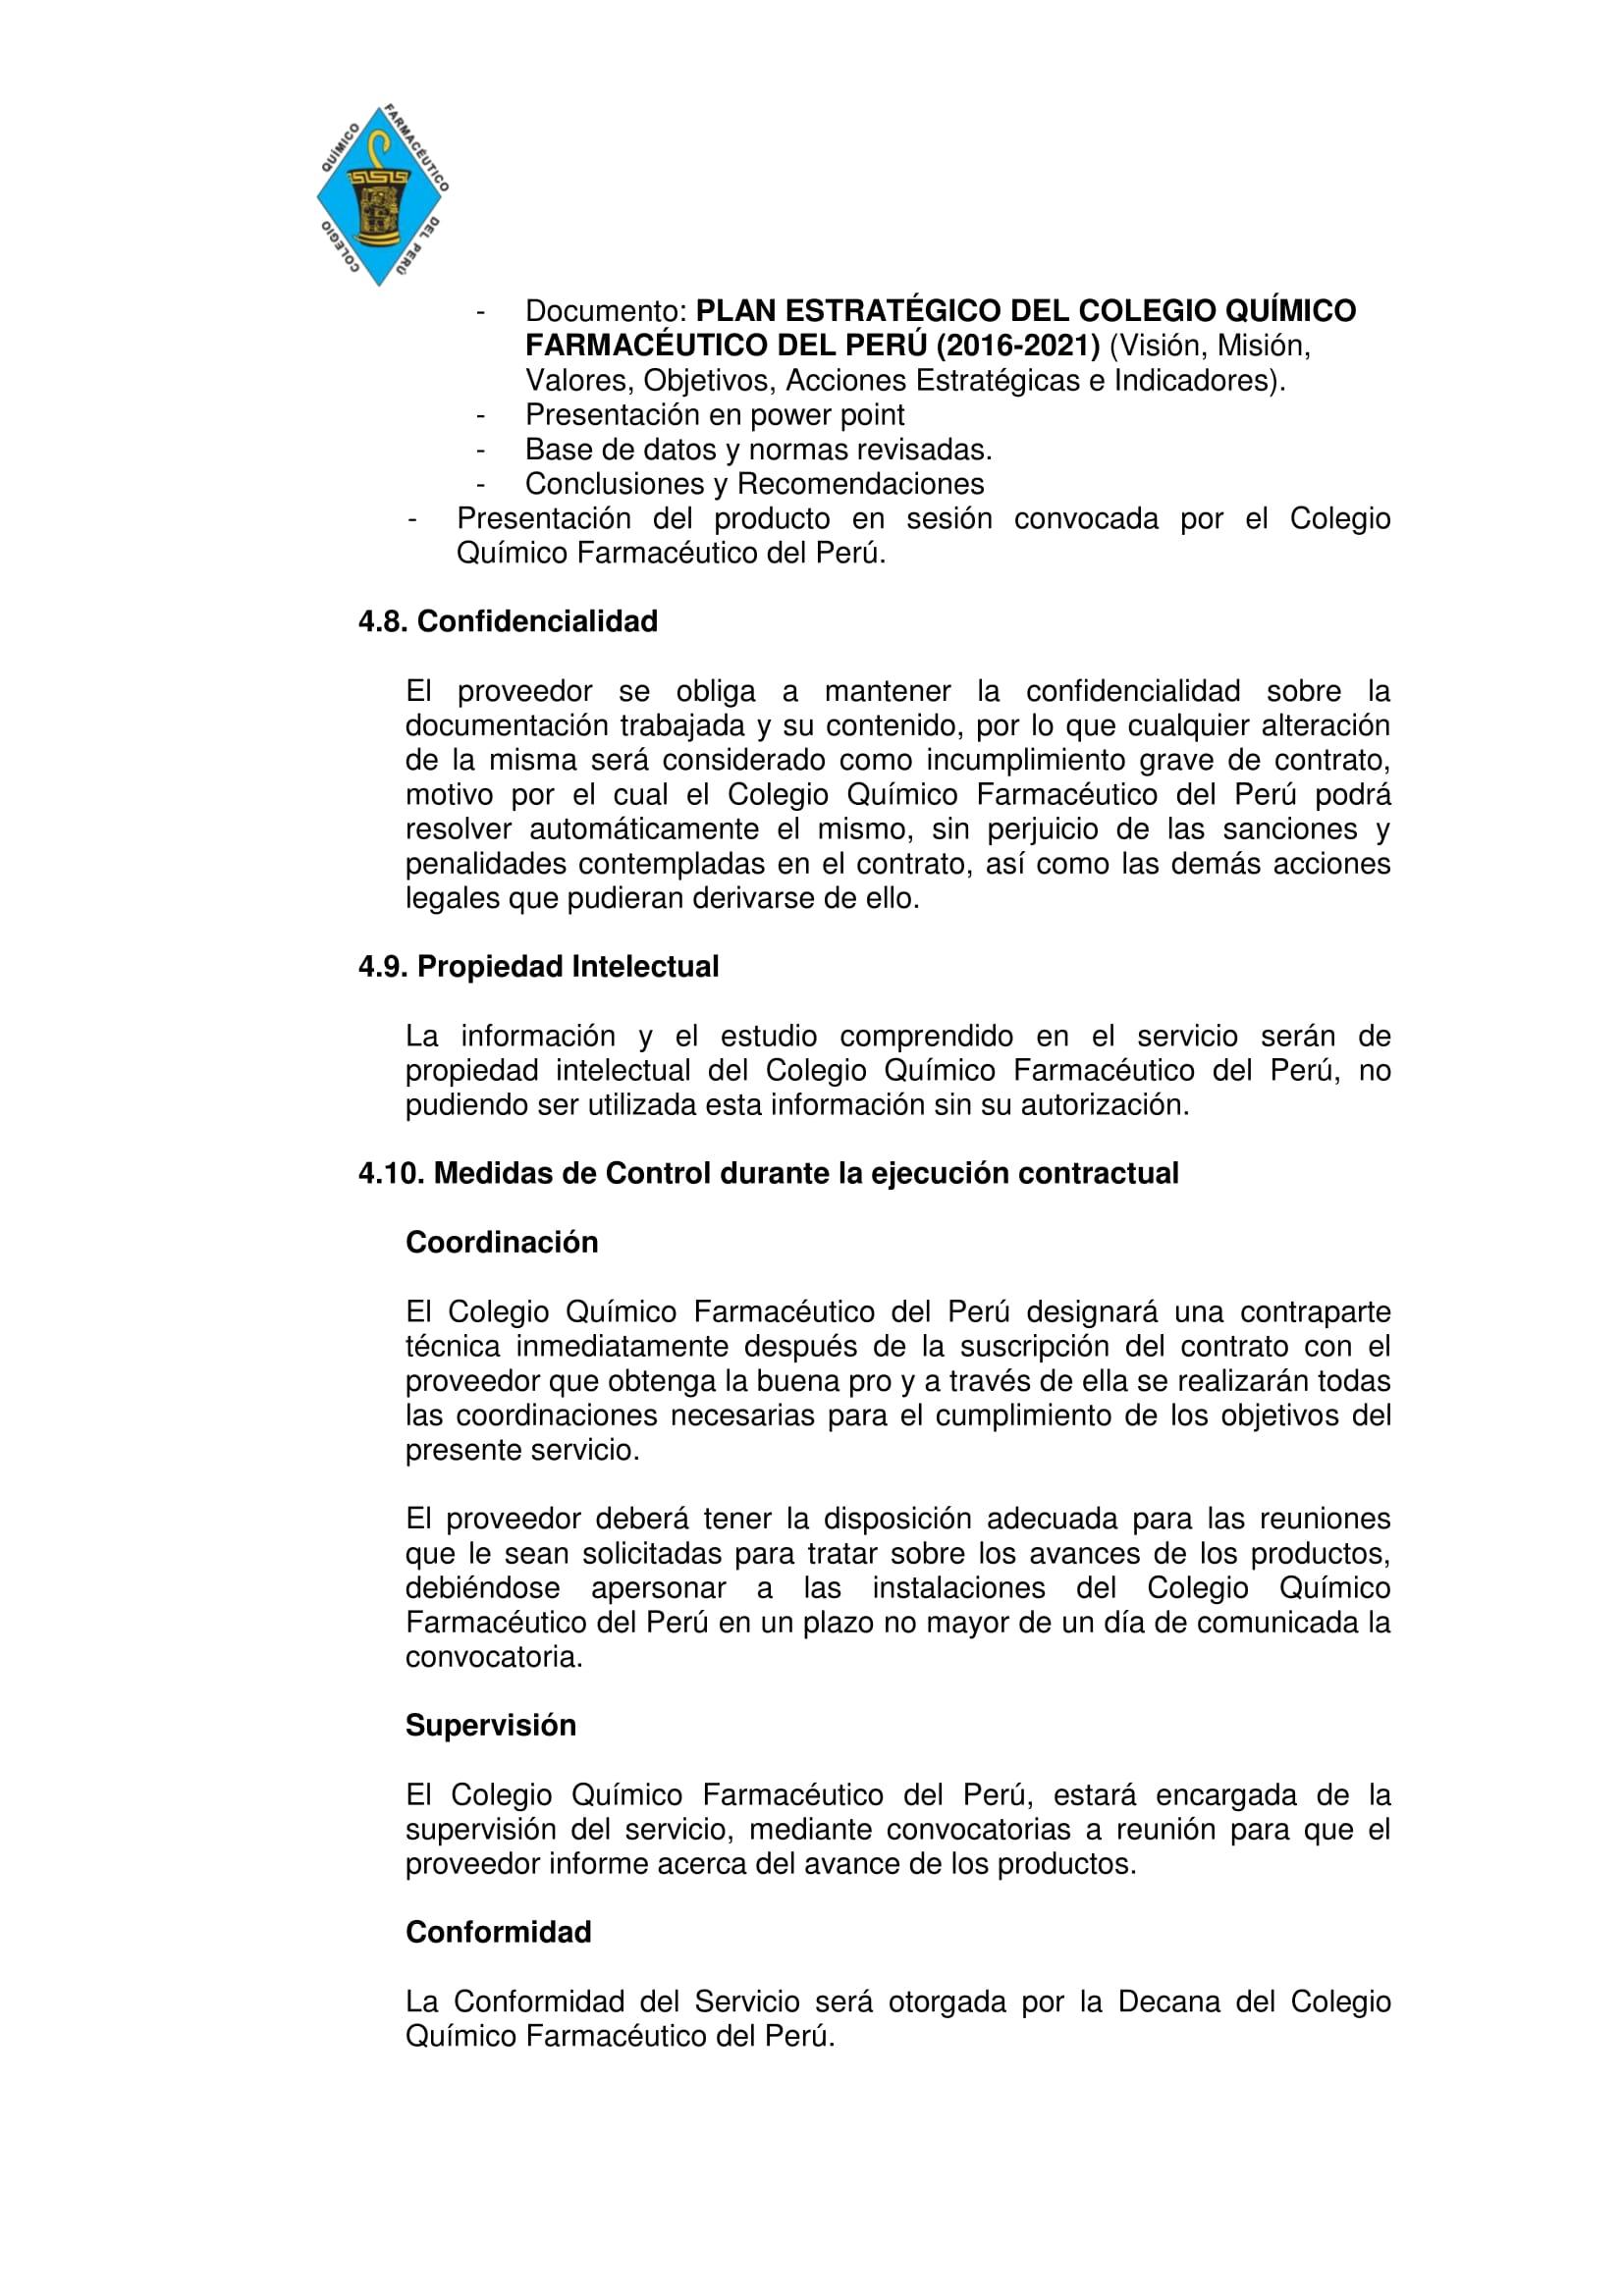 tdr-plan-estrategico-cqfp-4